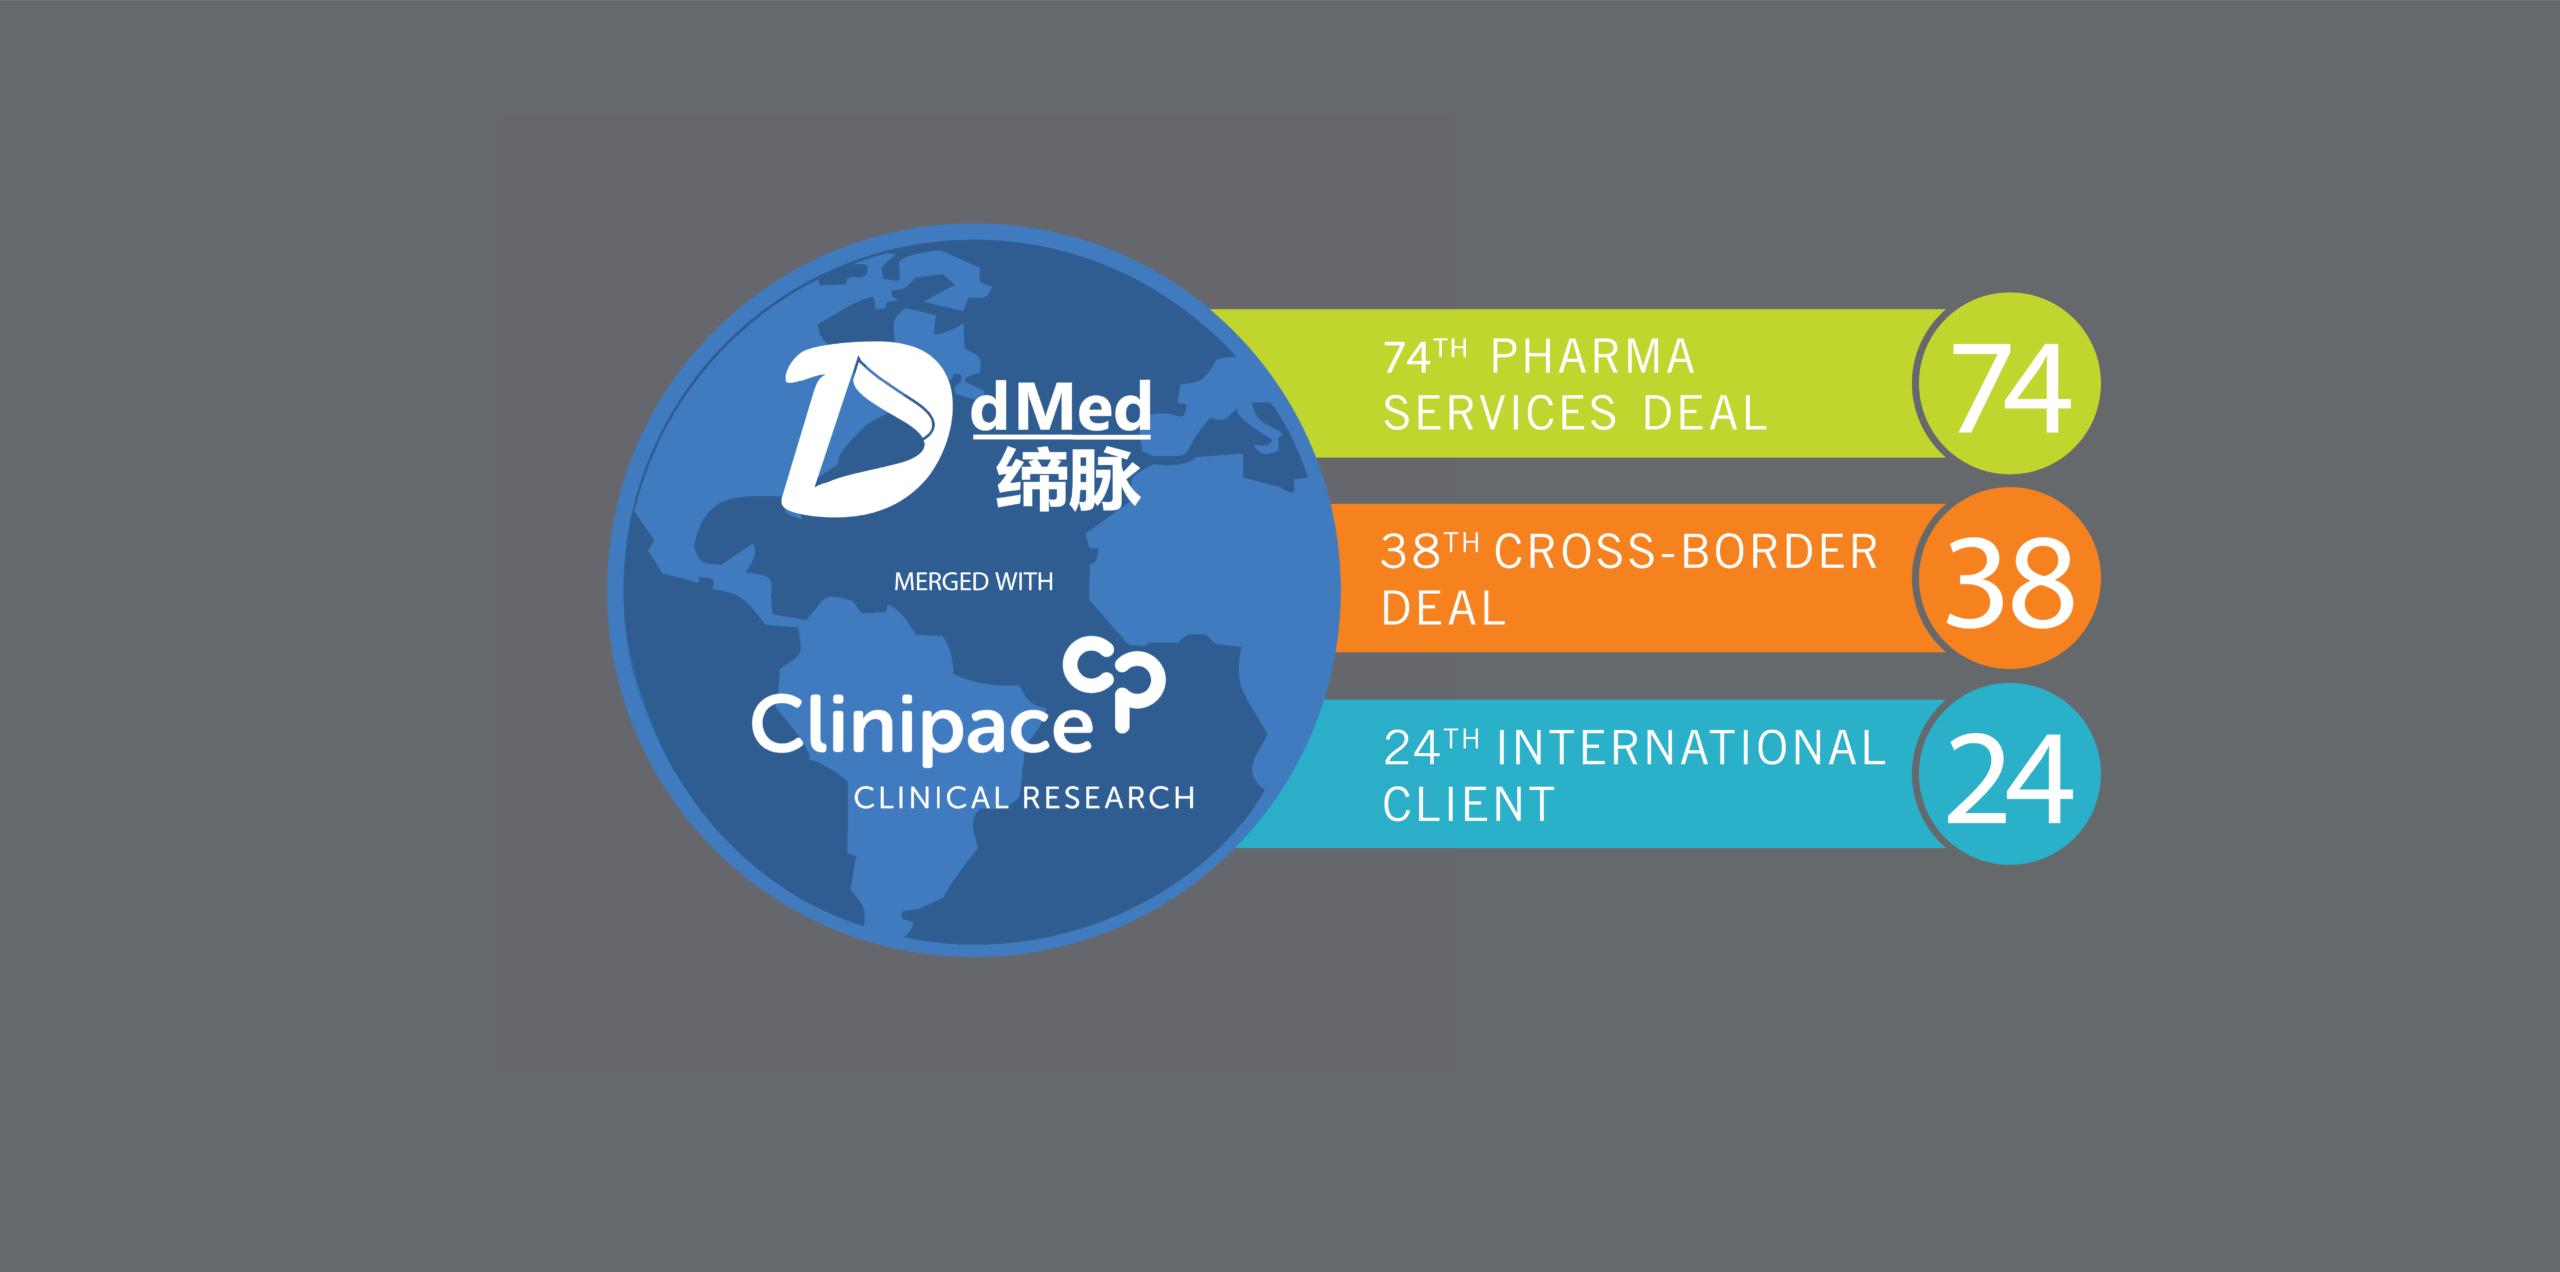 dMed and Clinipace Merge  to Create Global CRO Powerhouse